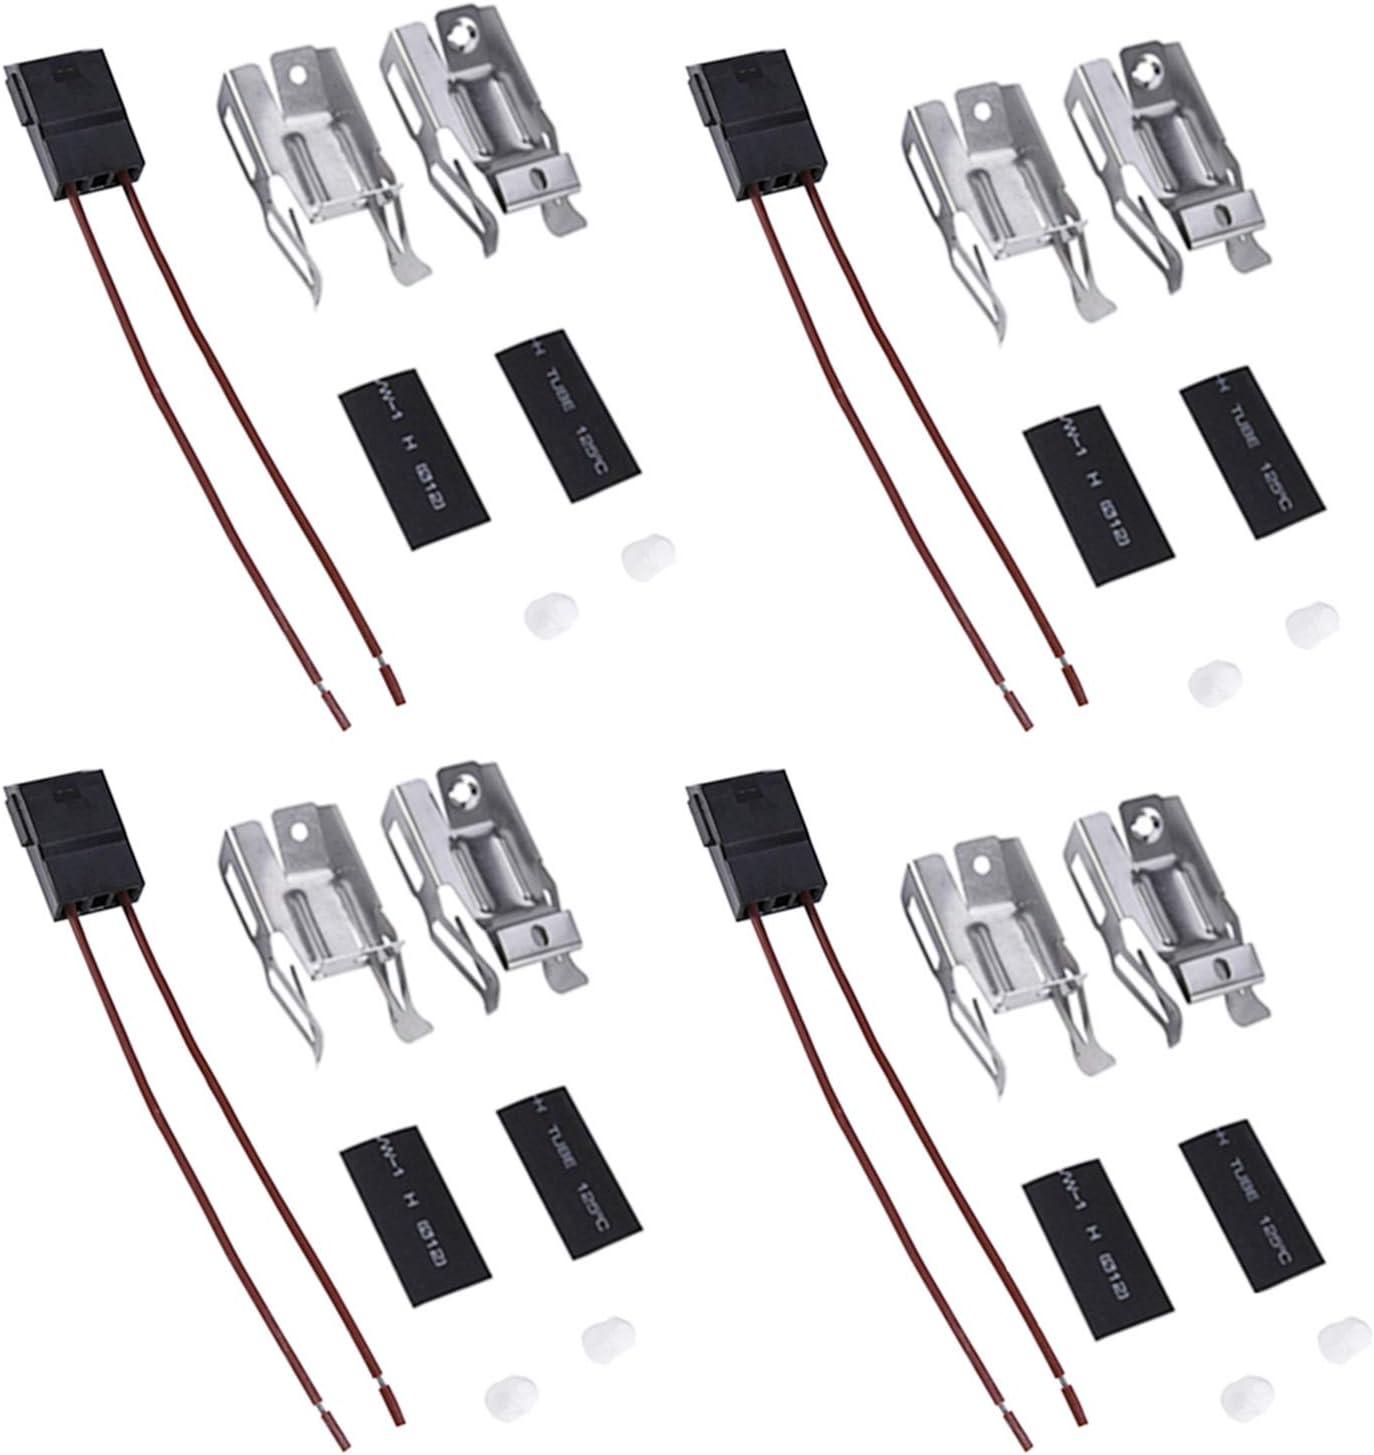 Range Surface Element Receptacle Terminal Block Kit 5303935058 RR117, Replaces 330031 WB17X210 814399 RR109 5303274292 5301167733 (4 Pack)